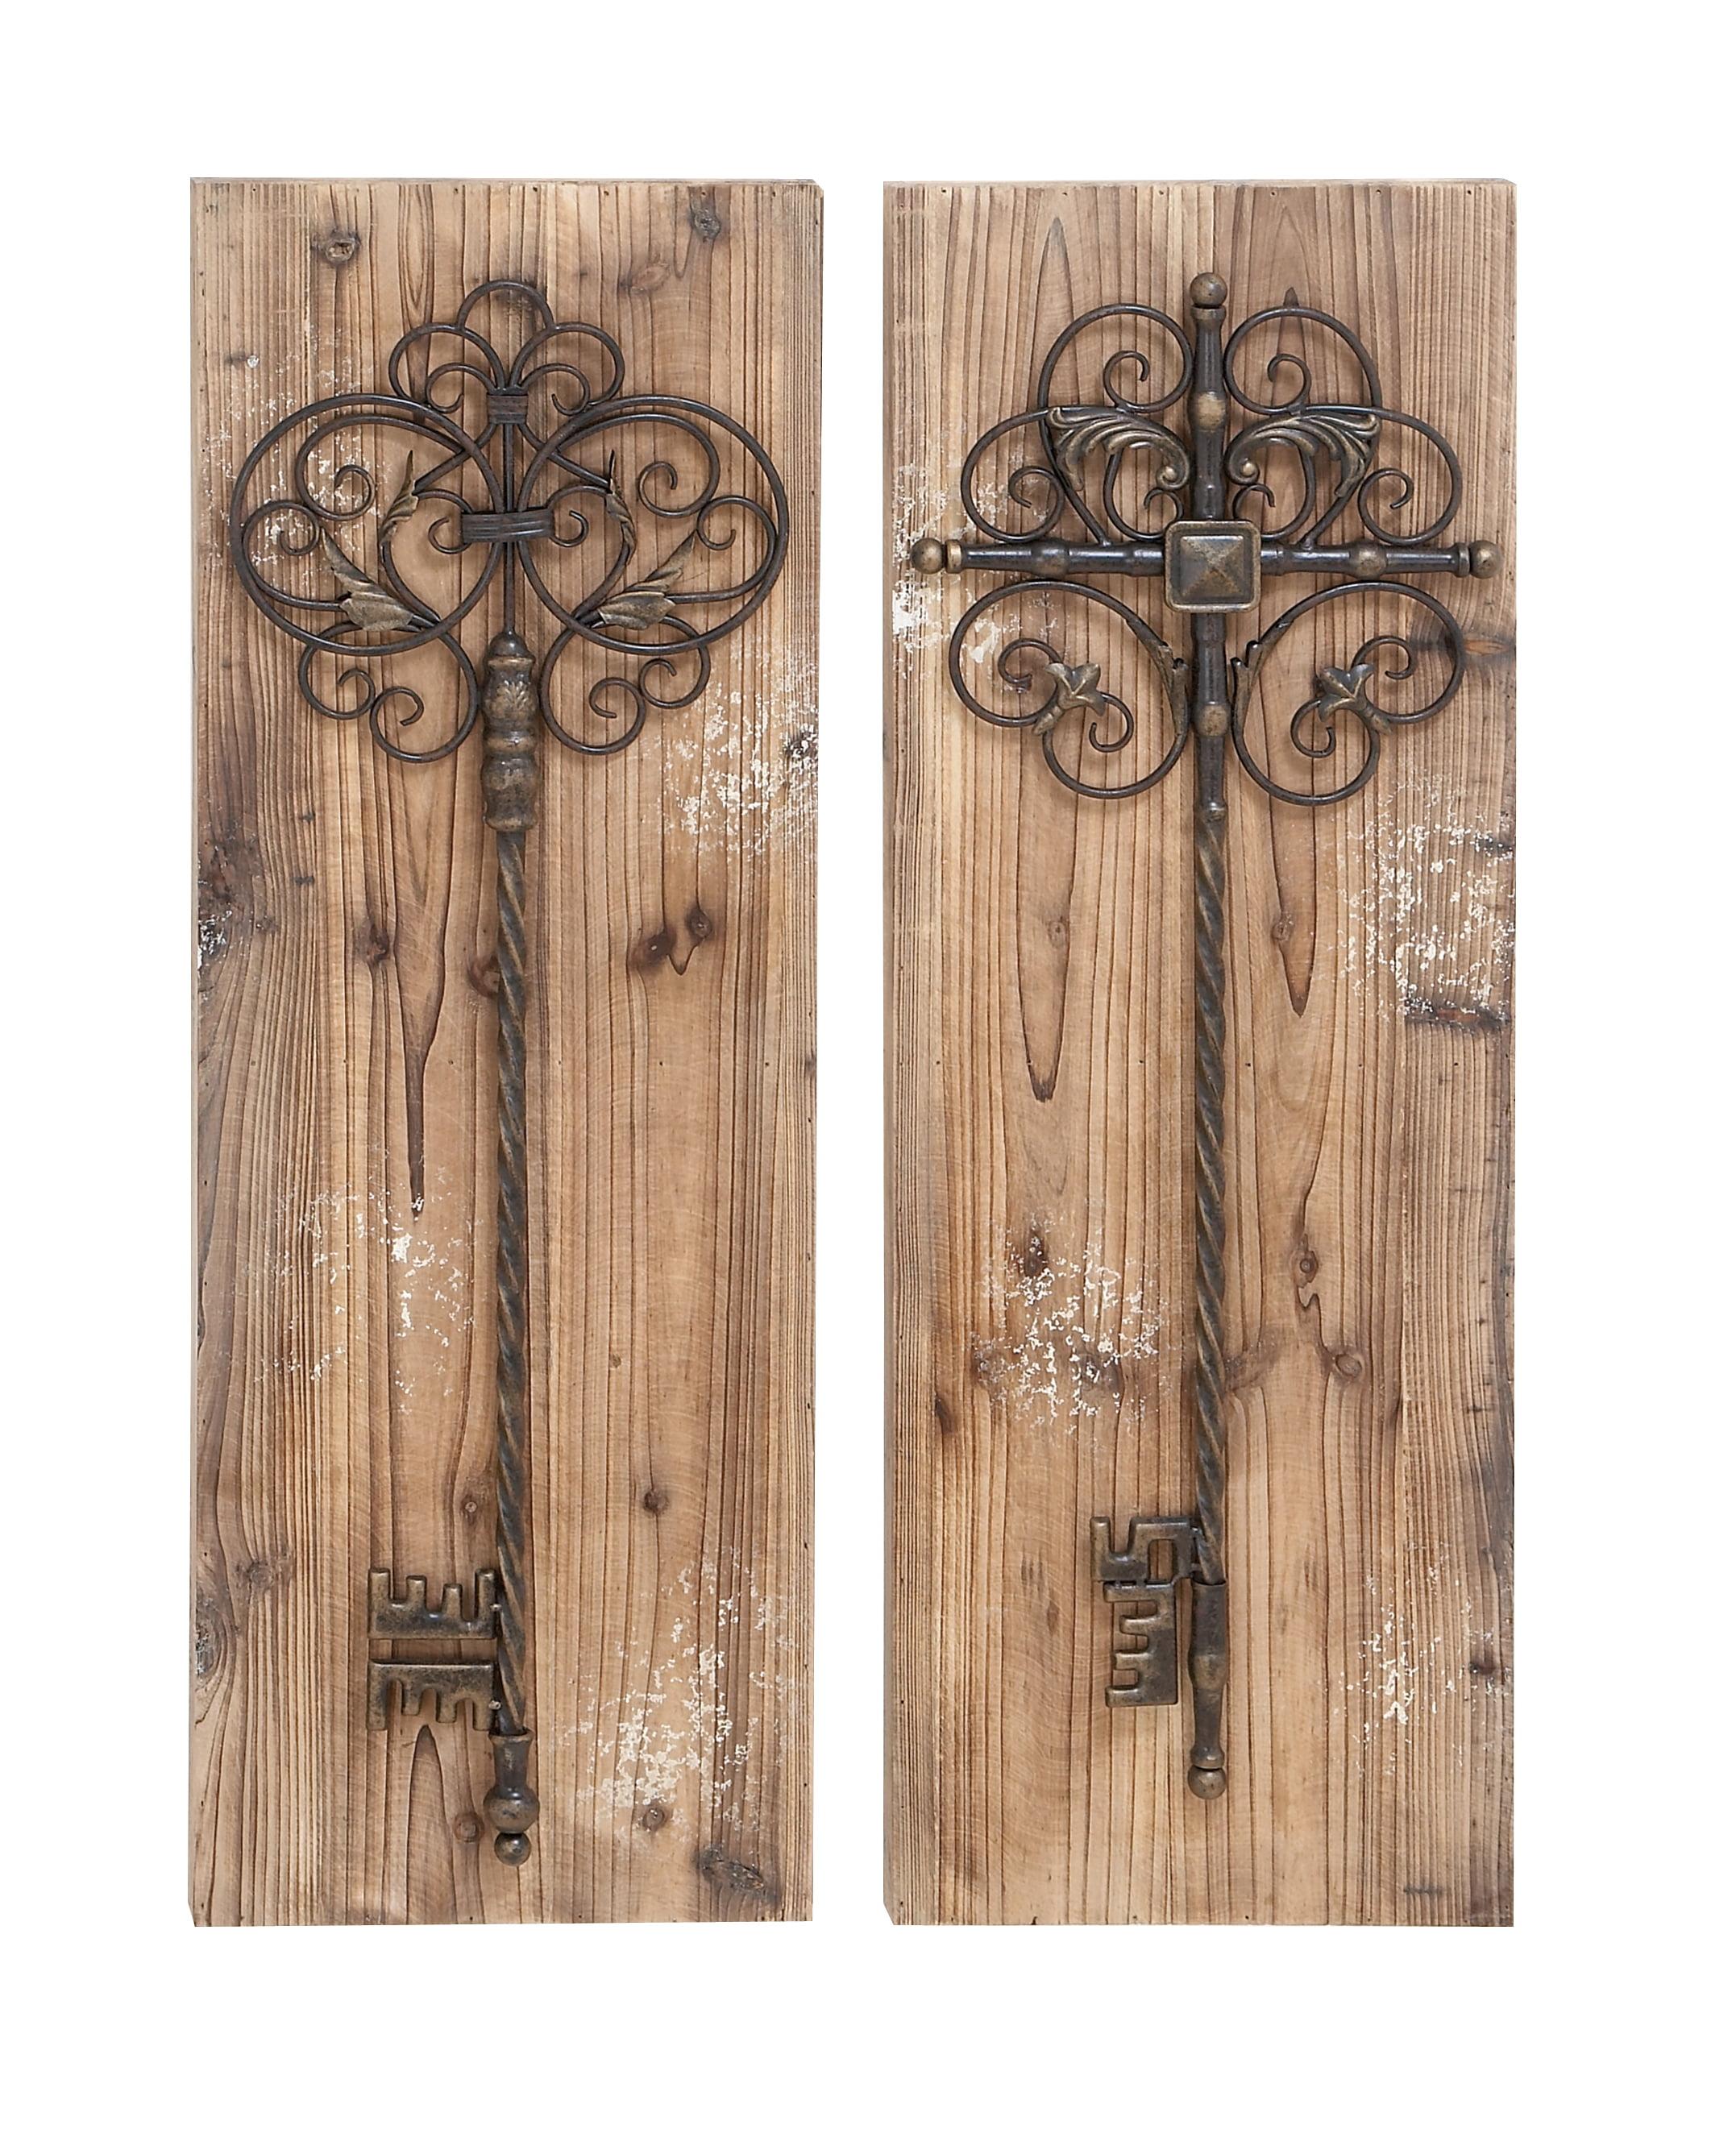 Enchanting Key Door Wall Plaque In Aged Wood by Benzara